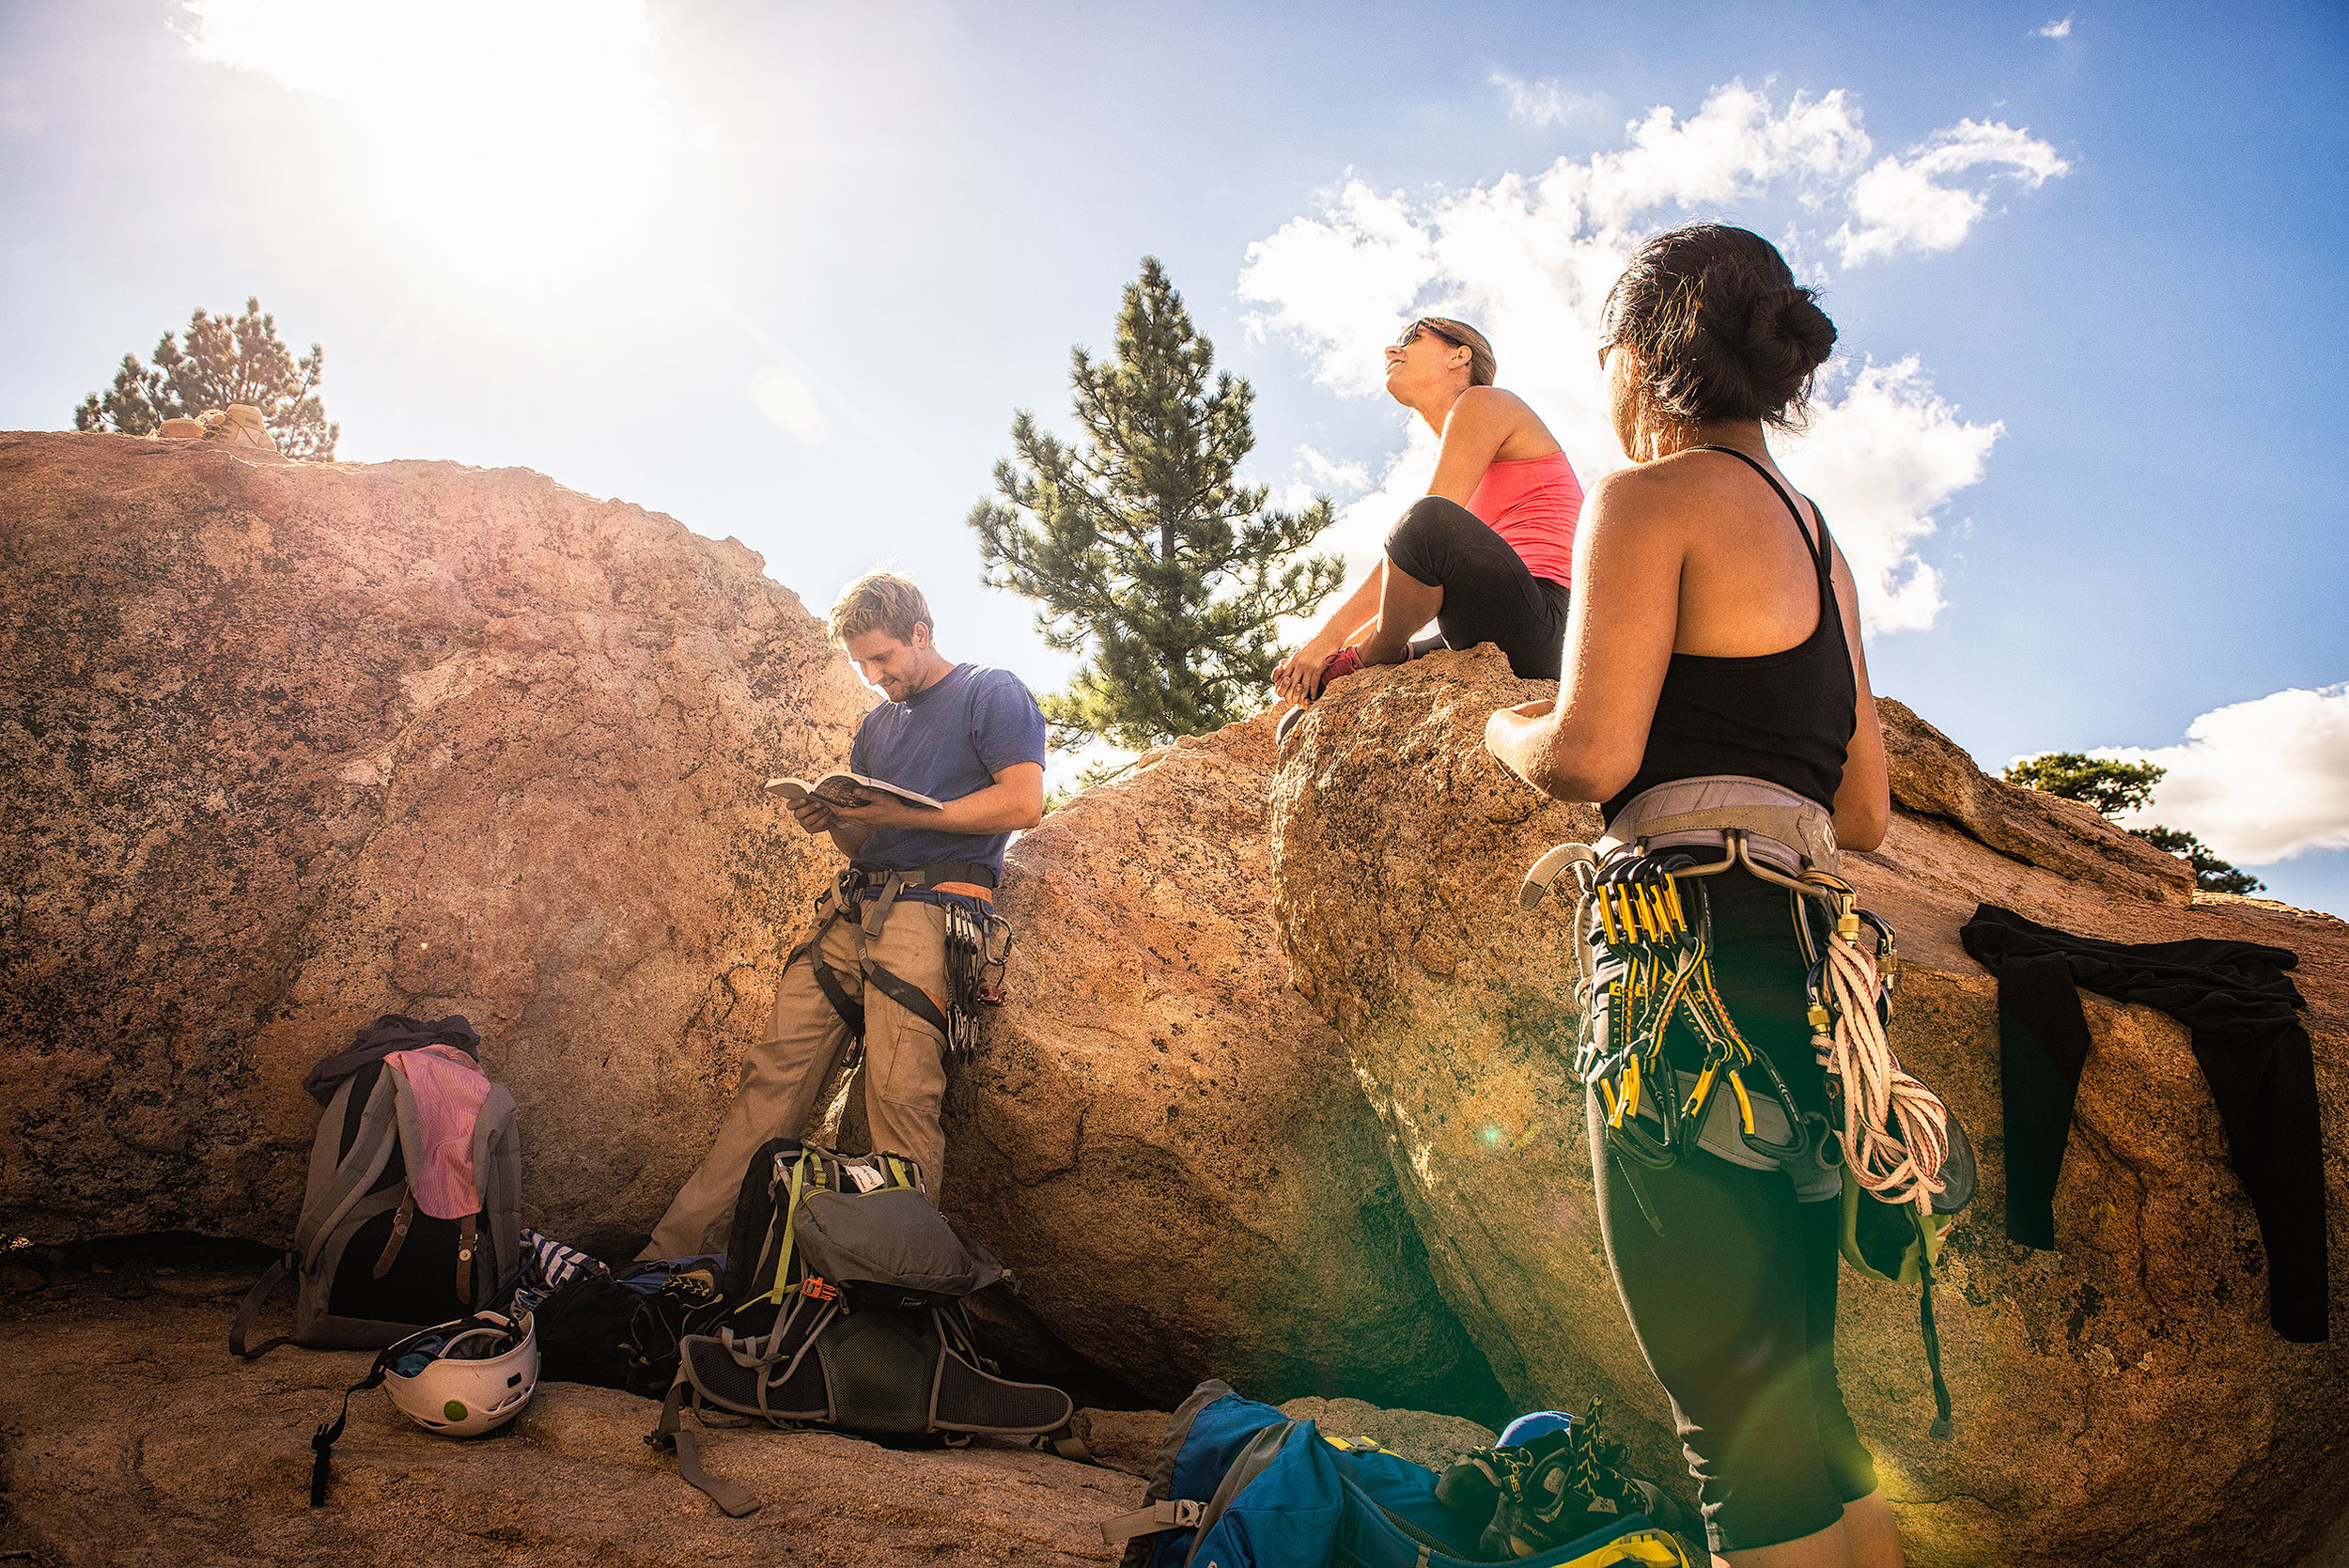 austin-trigg-southern-california-holcomb-valley-climbing-sunrise-gear-outdoor-adventure.jpg